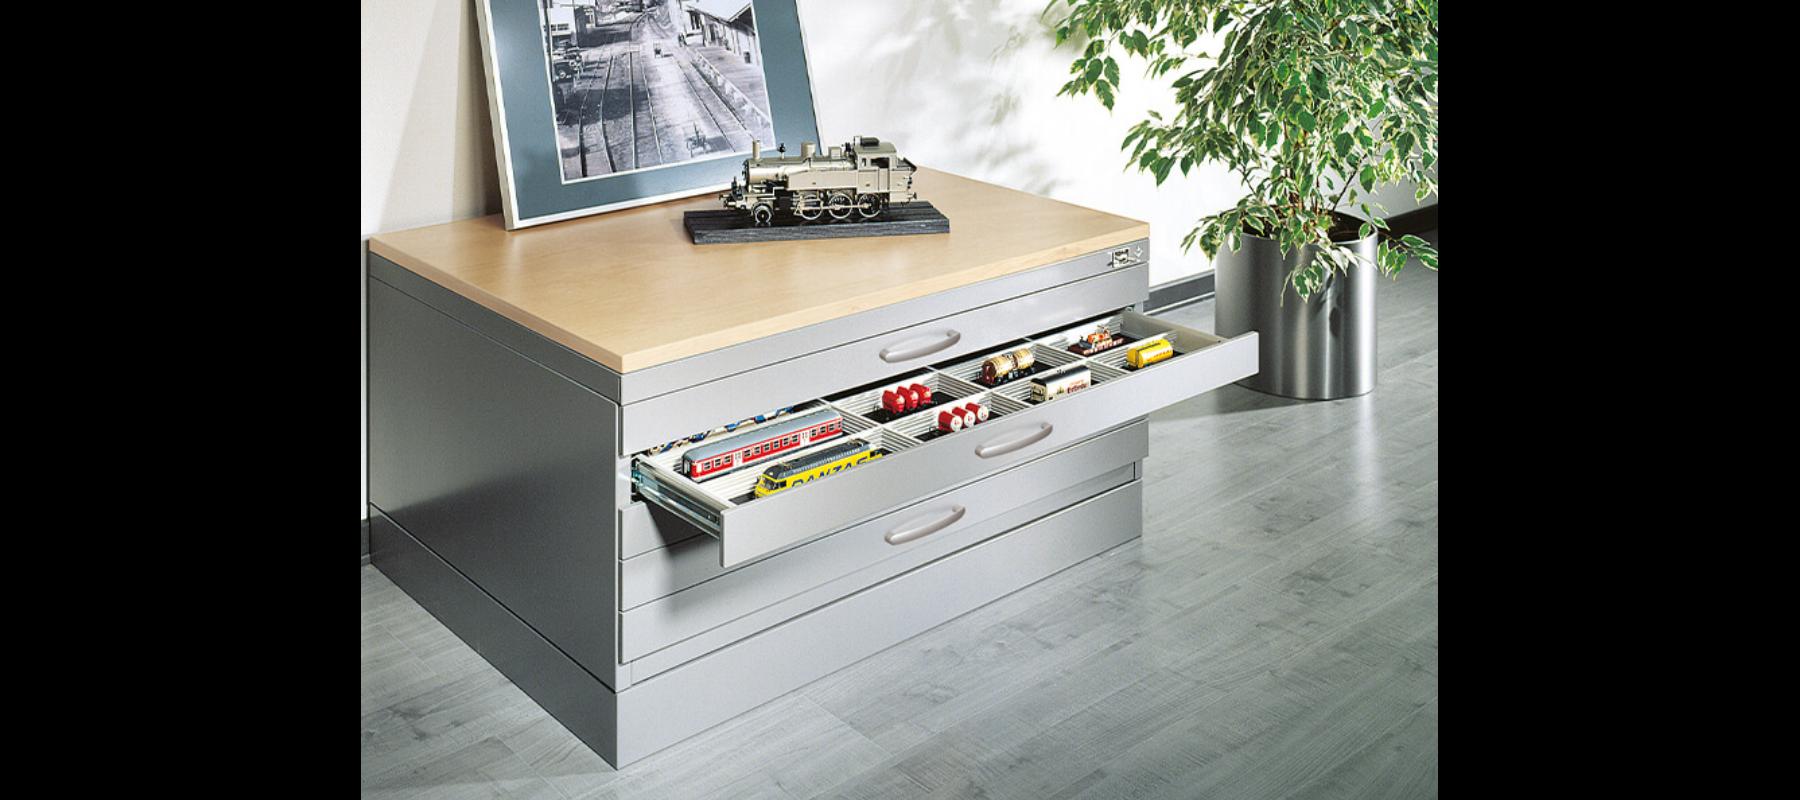 metalowe meble biurowe szafy szufladowe cp detale - 08